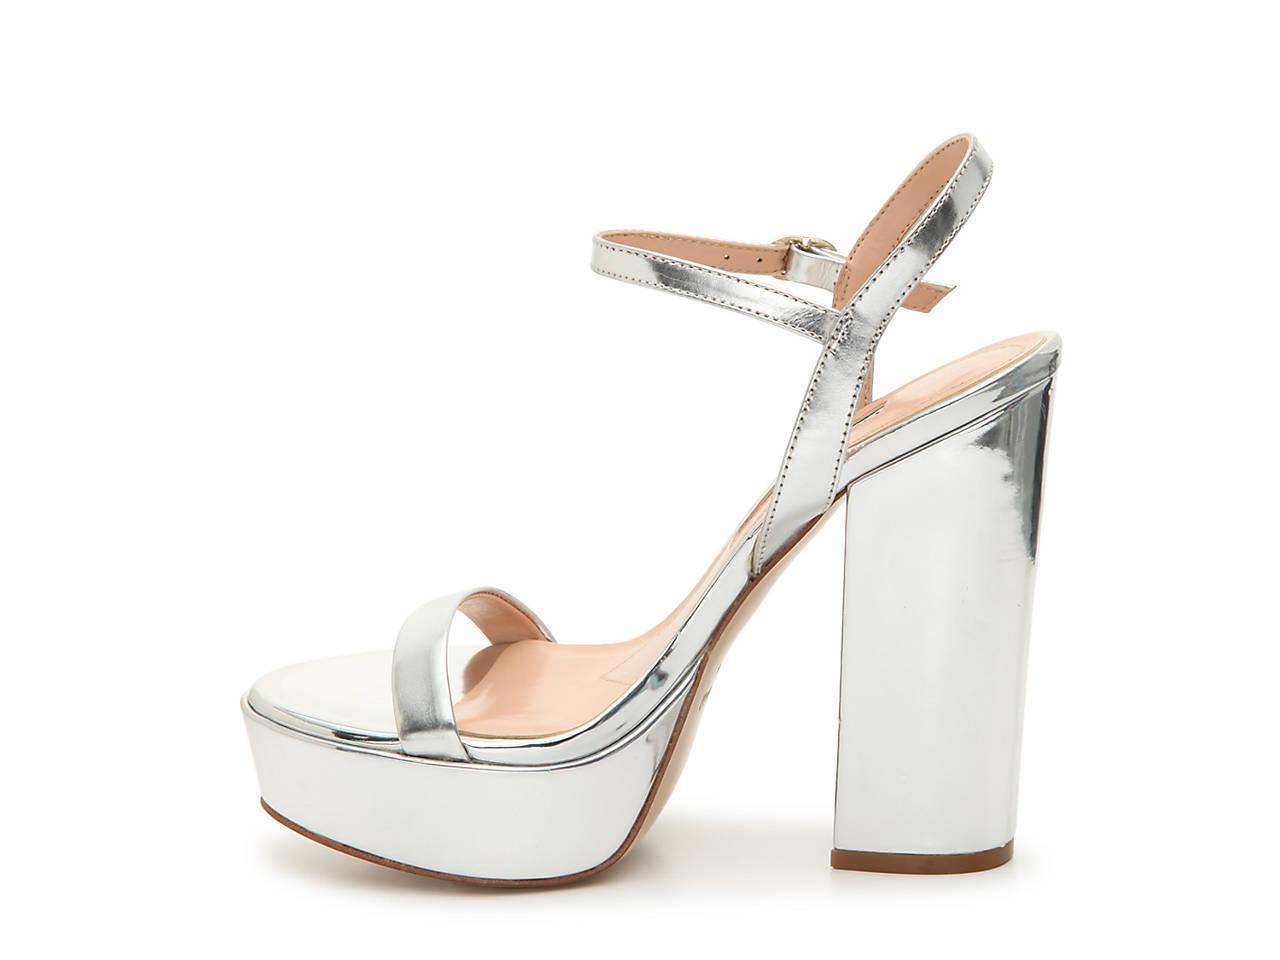 3cbc8fd64e84 Charles David Regal Platform Sandal Women s Shoes